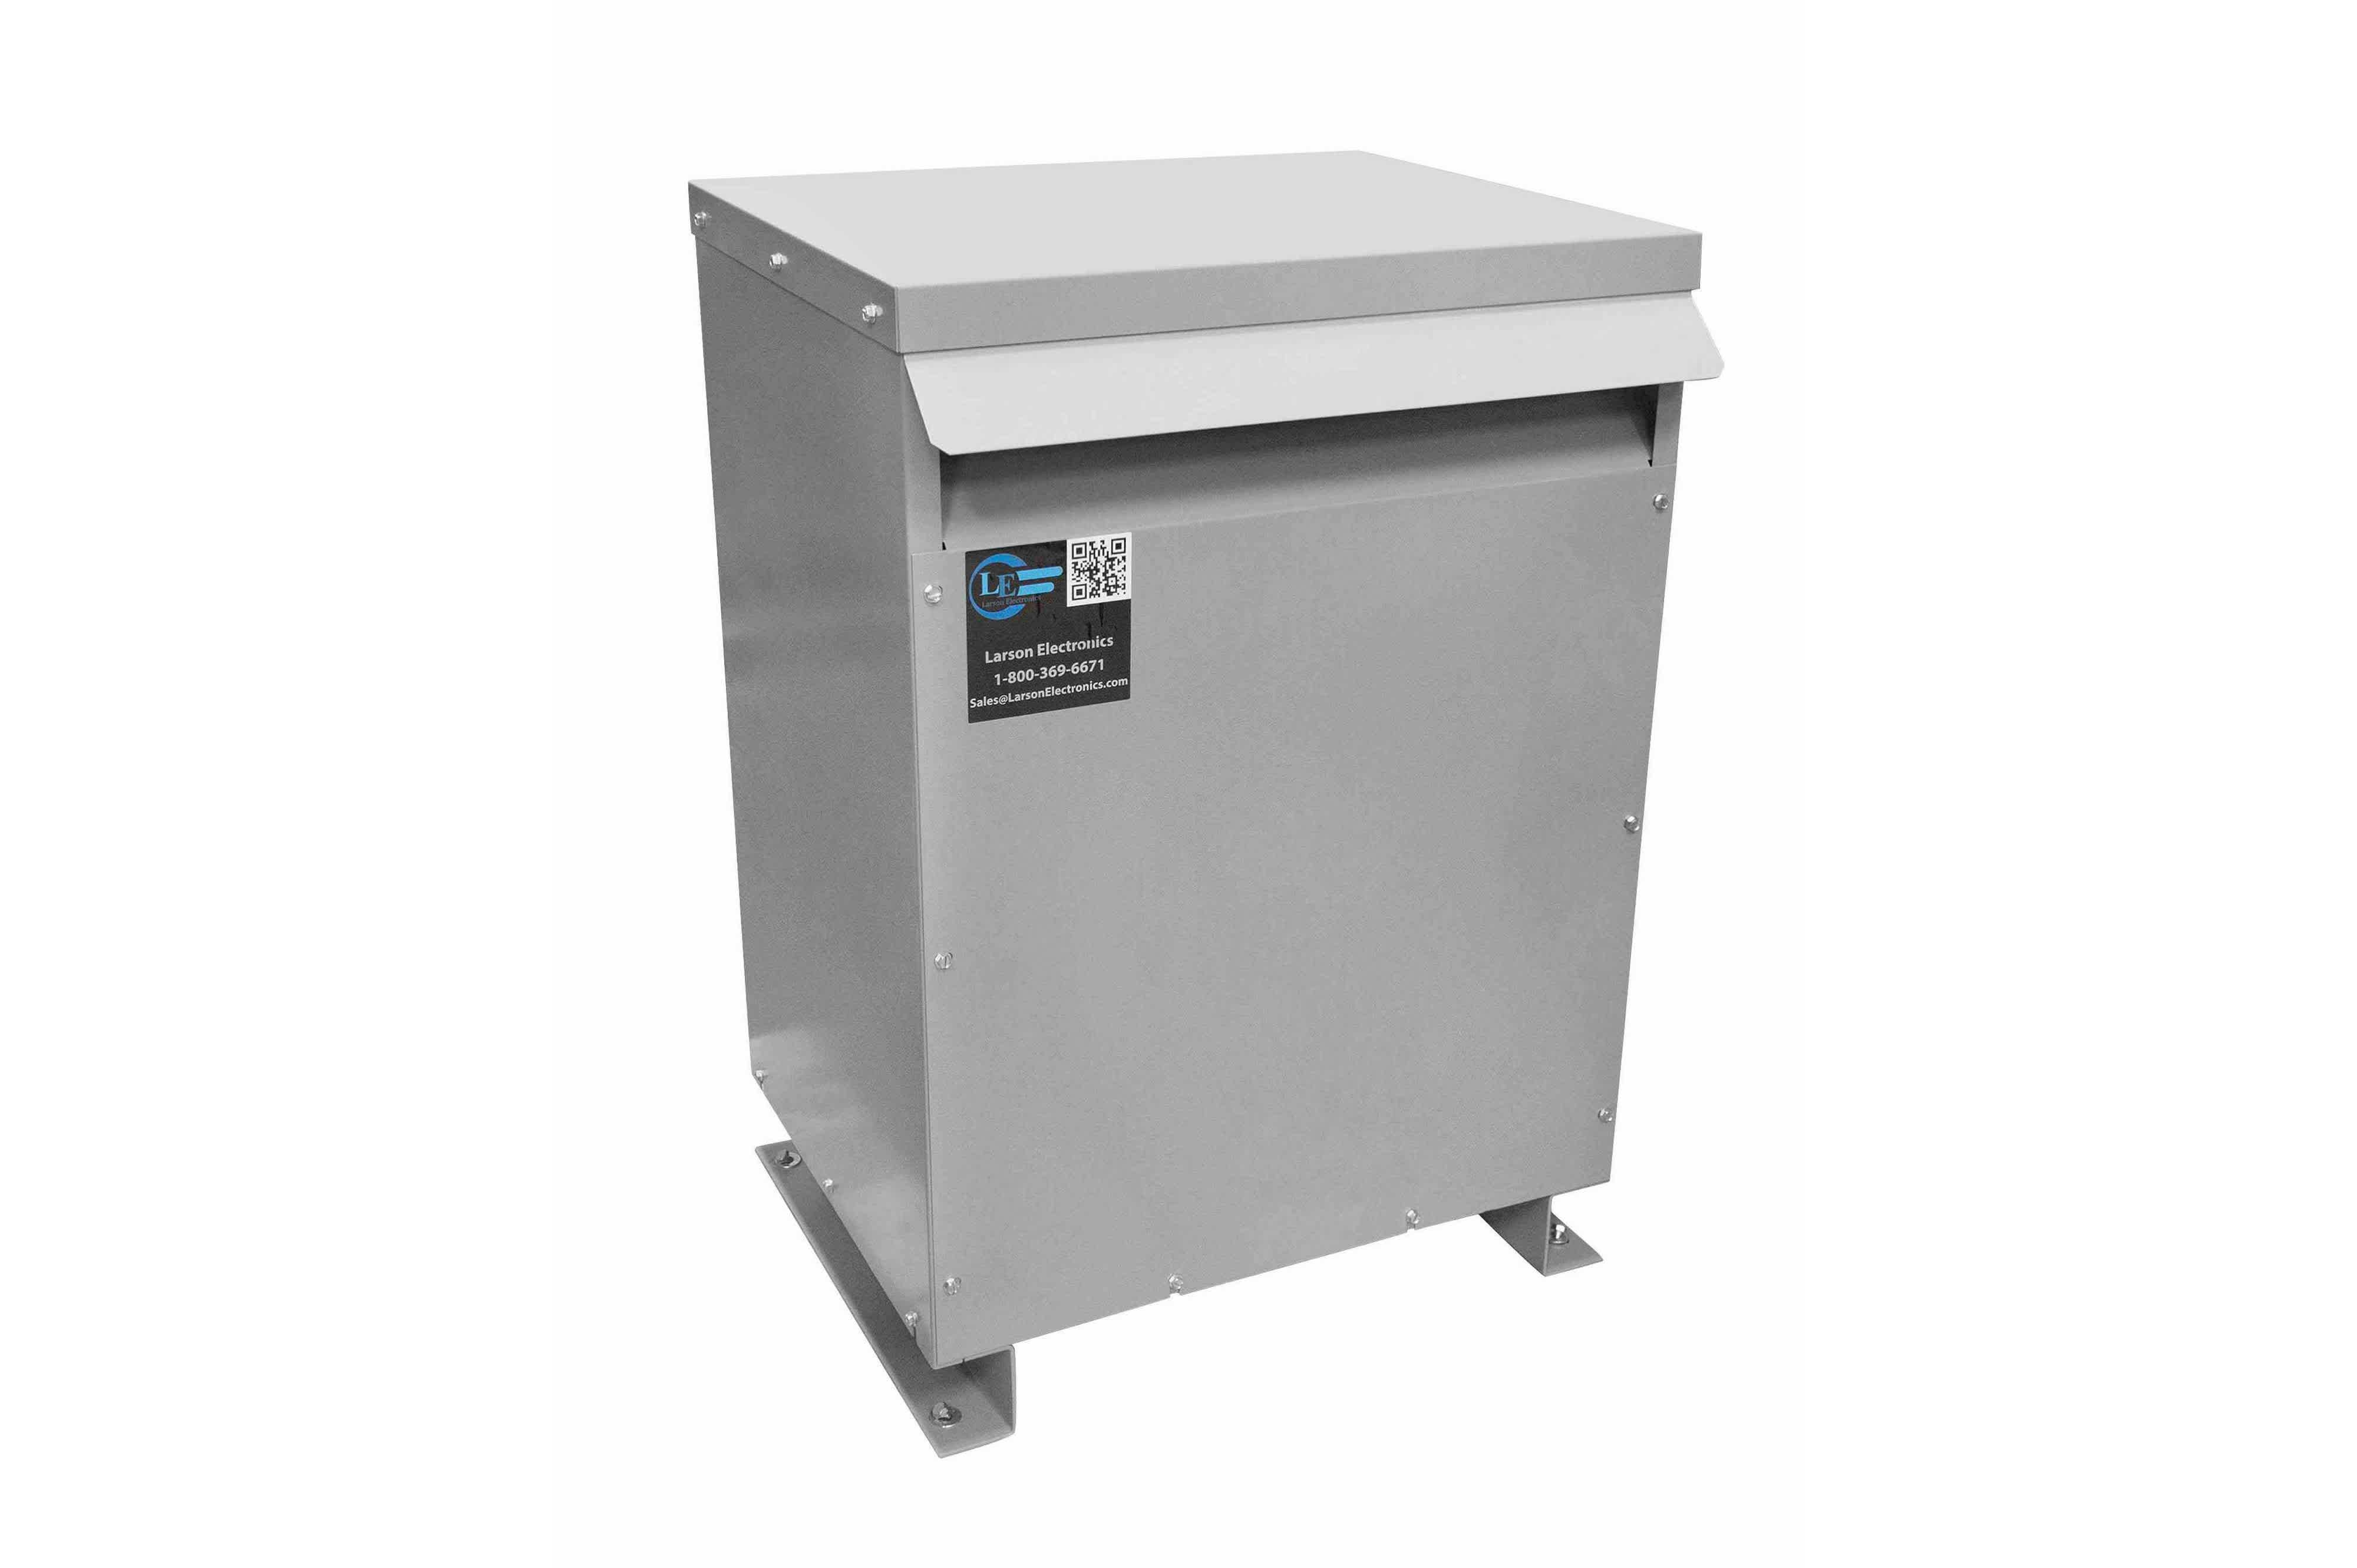 200 kVA 3PH Isolation Transformer, 575V Wye Primary, 208V Delta Secondary, N3R, Ventilated, 60 Hz